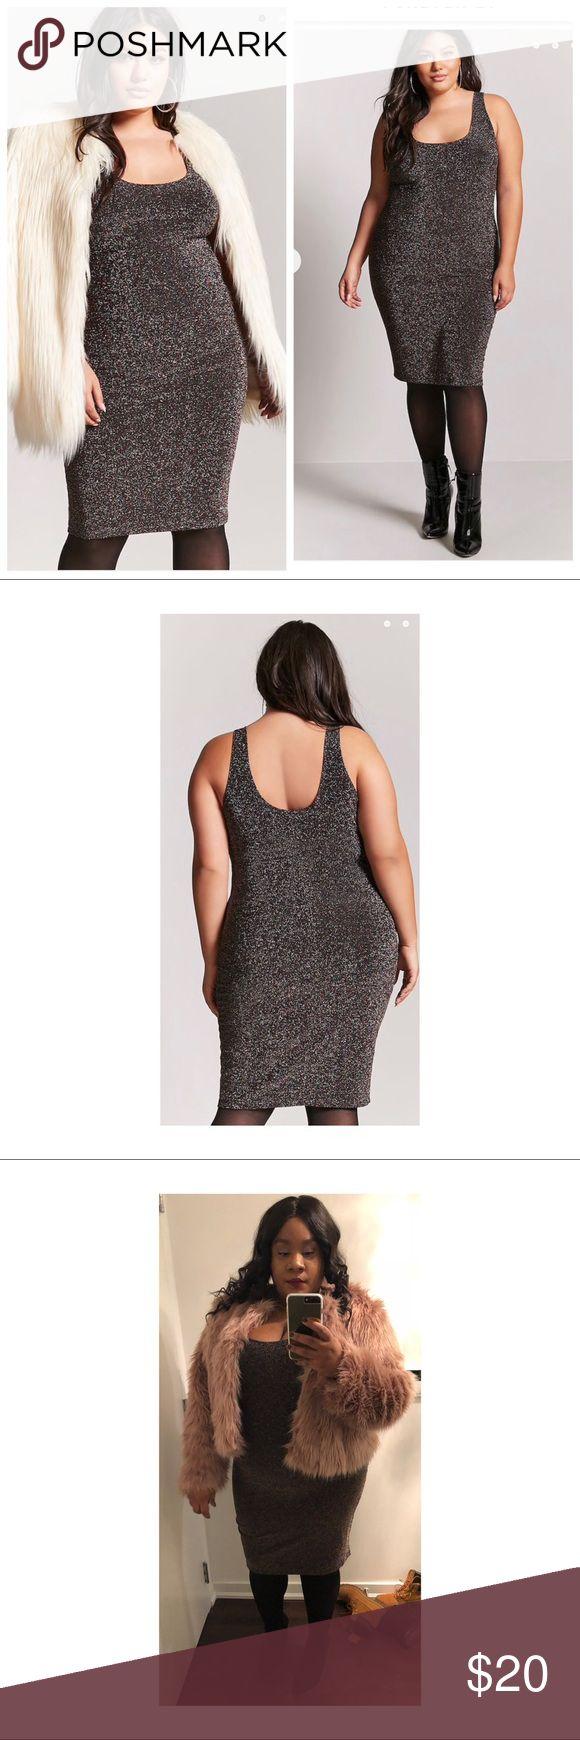 Metallic Bodycon Dress Plus size bulk/multi metallic bodycon dress worn once. Size 3X Forever 21 Dresses